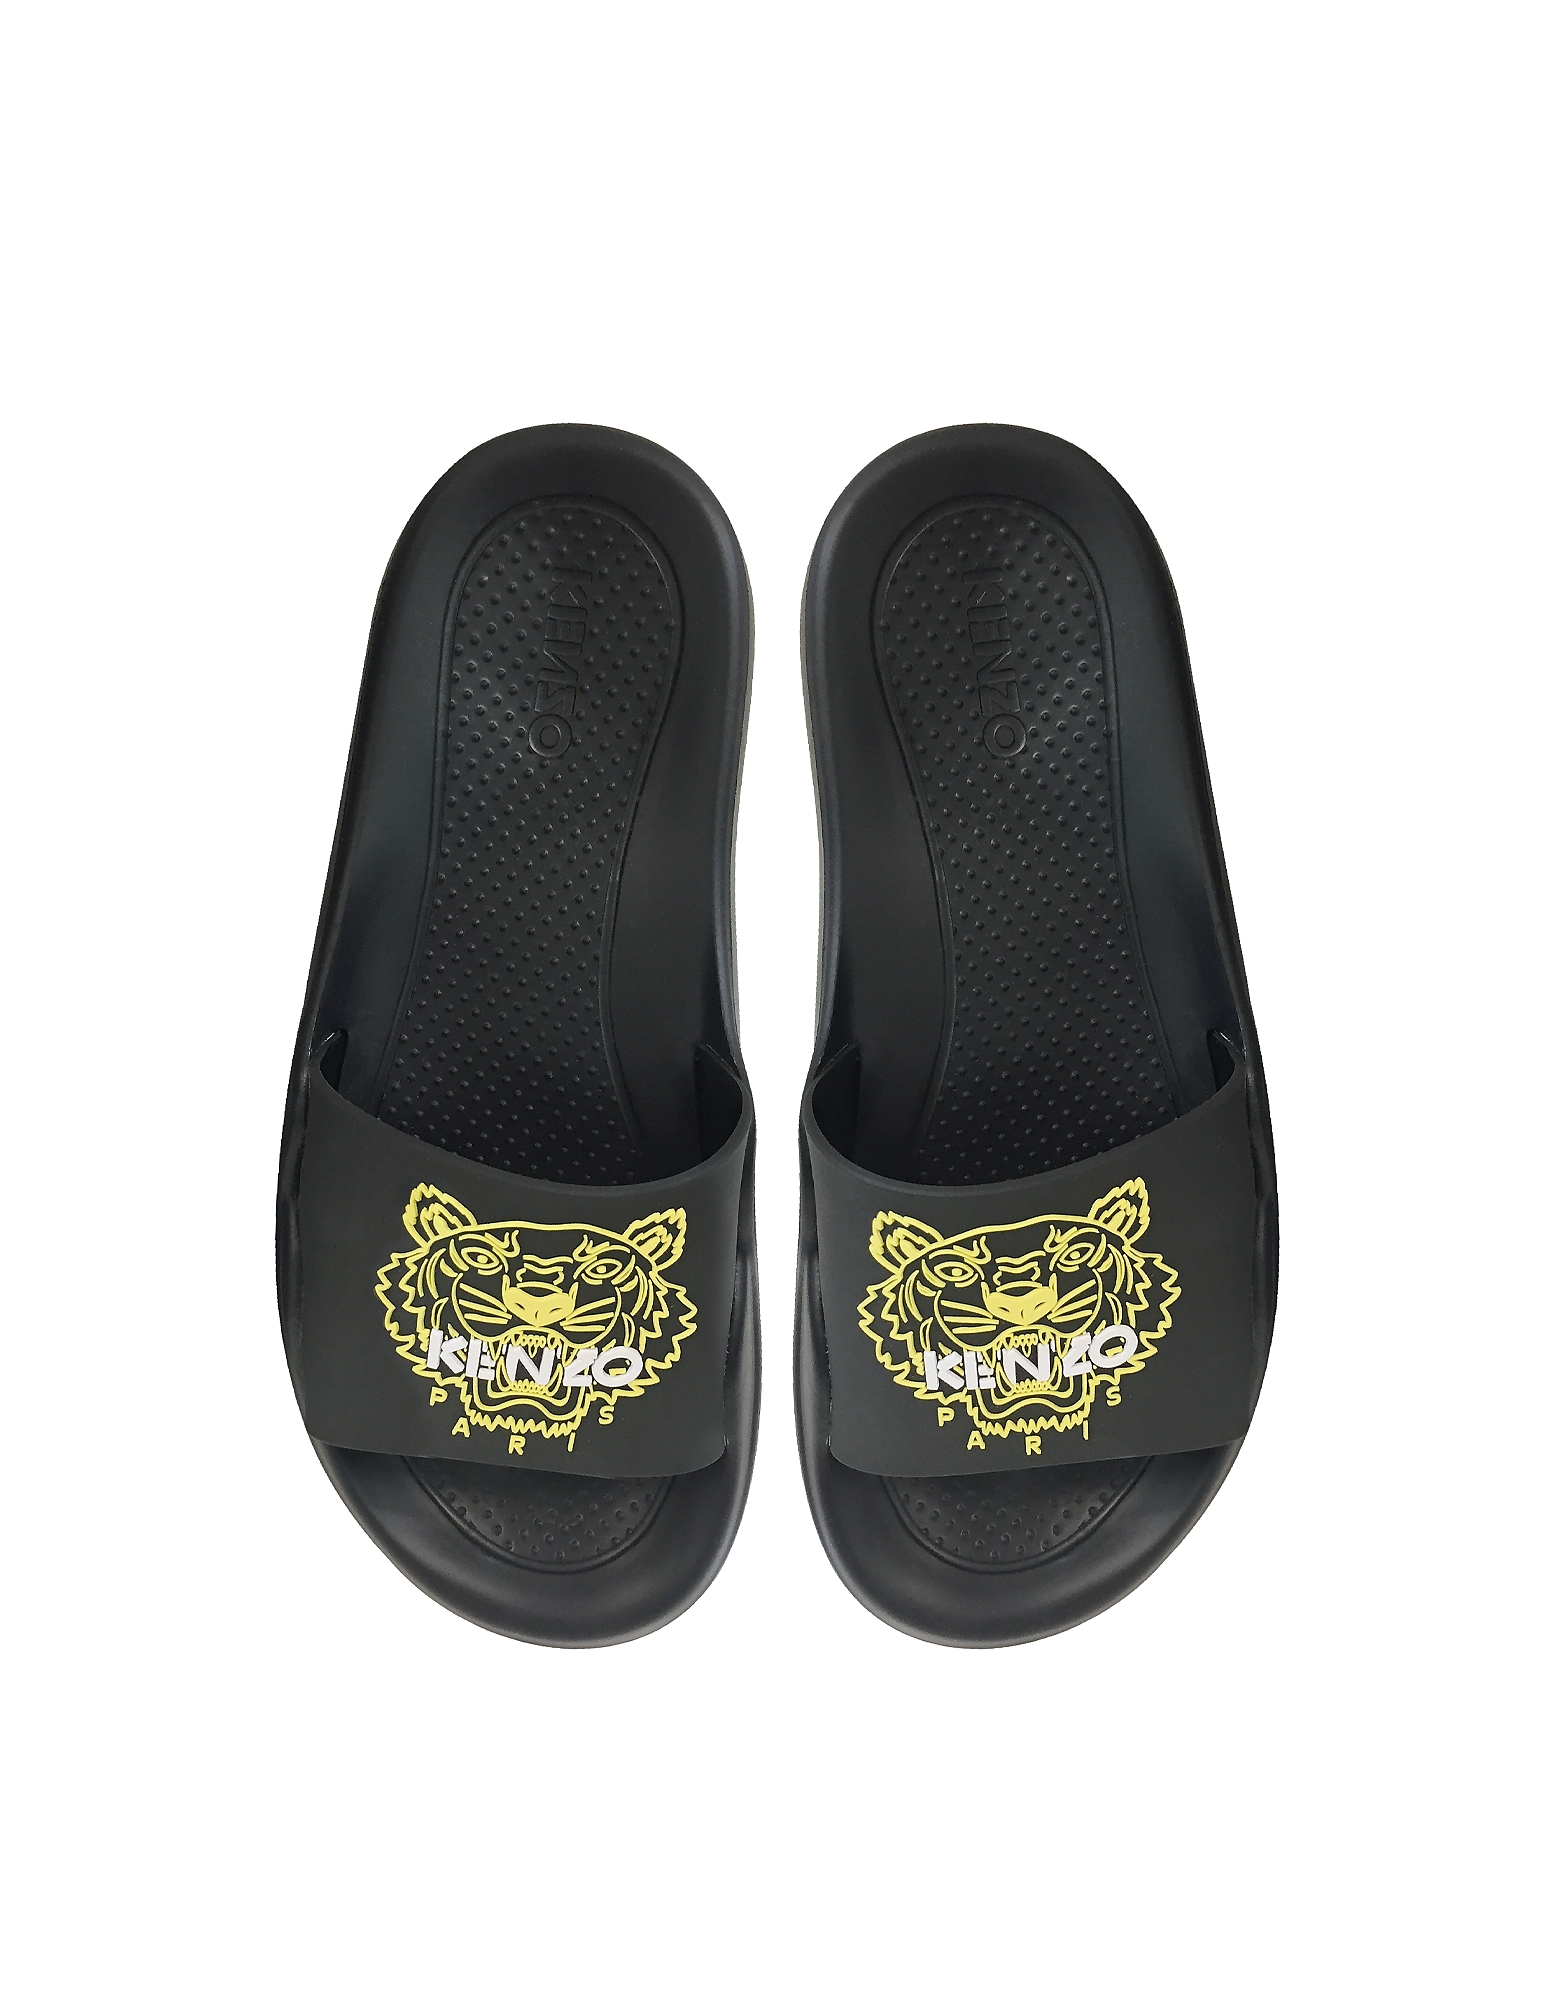 Kenzo Shoes, Black Tiger Women's Flat Sandals